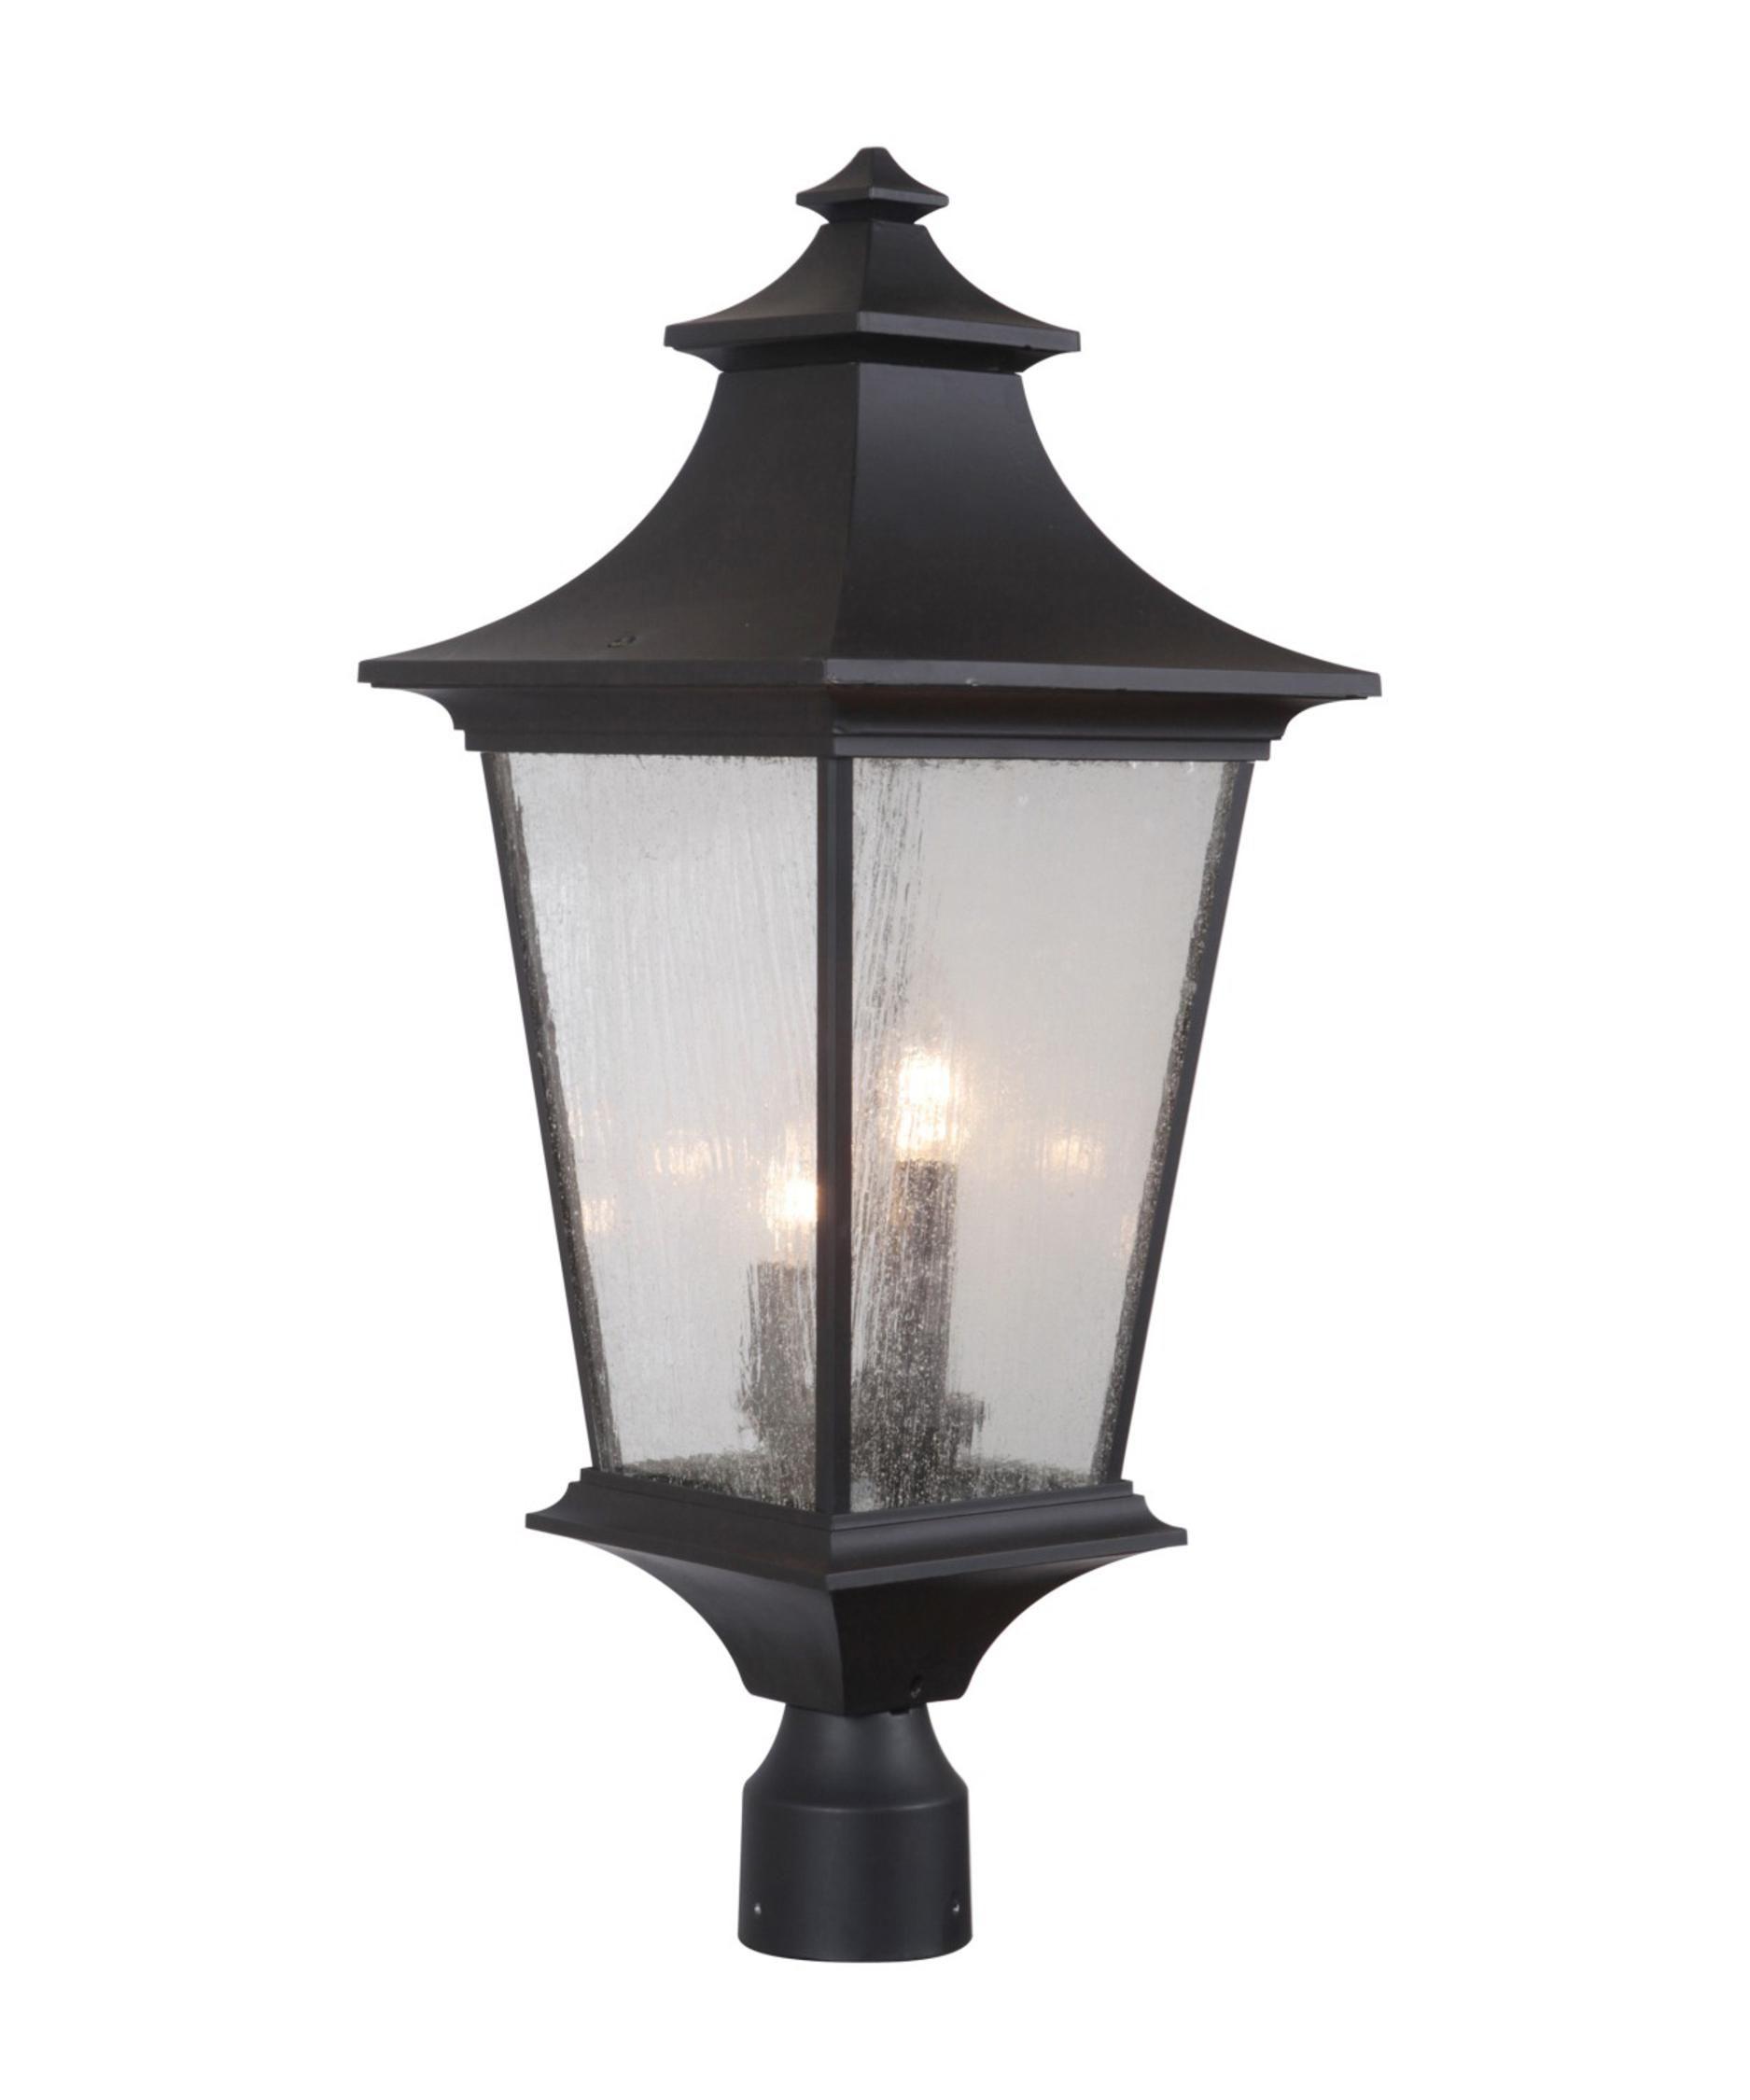 Craftmade Z1375 Argent Ii 3 Light Outdoor Post Lamp Outdoor Post Lights Post Lights Craftmade